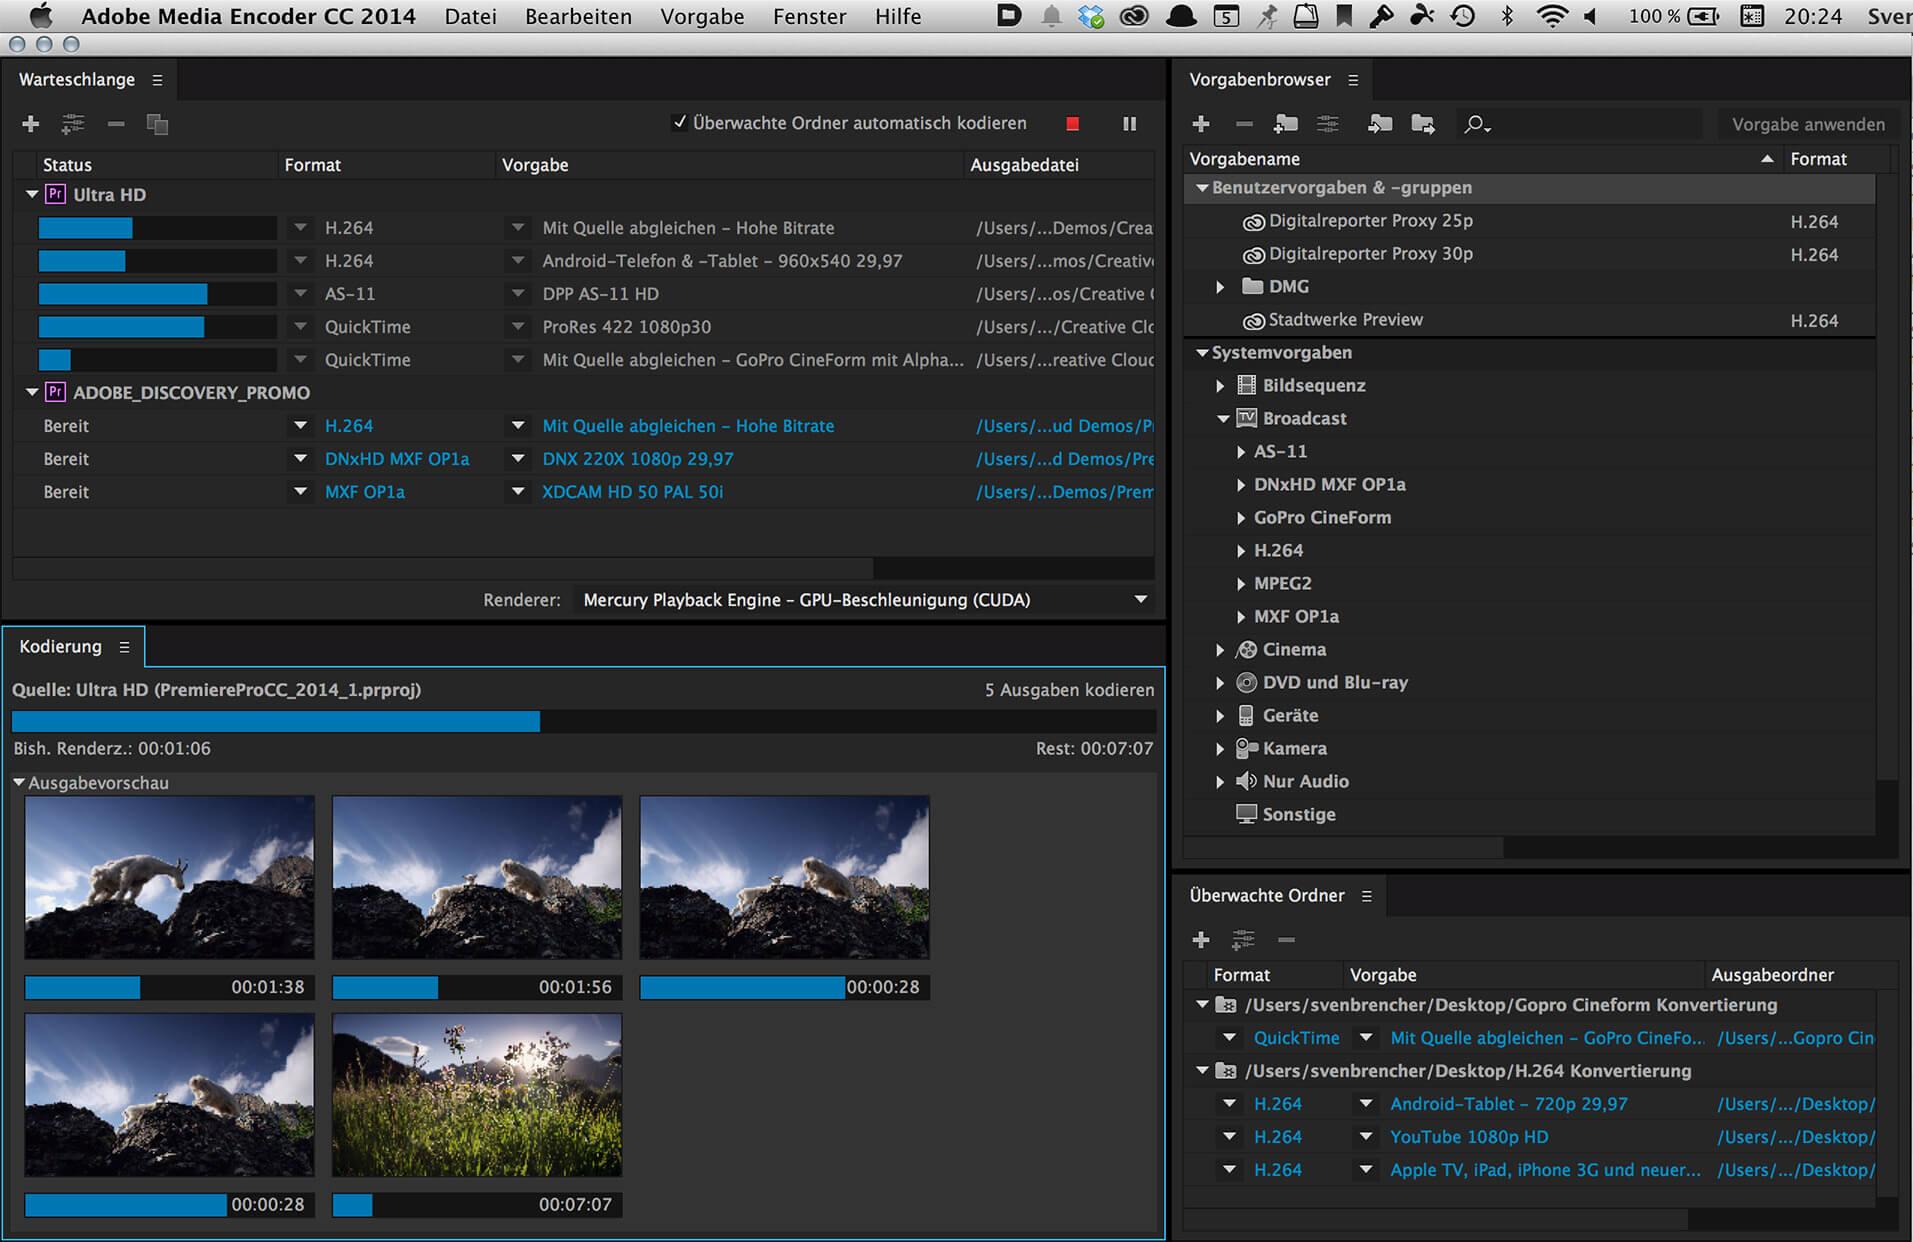 Arbeitsoberfläche vom Adobe Media Encoder